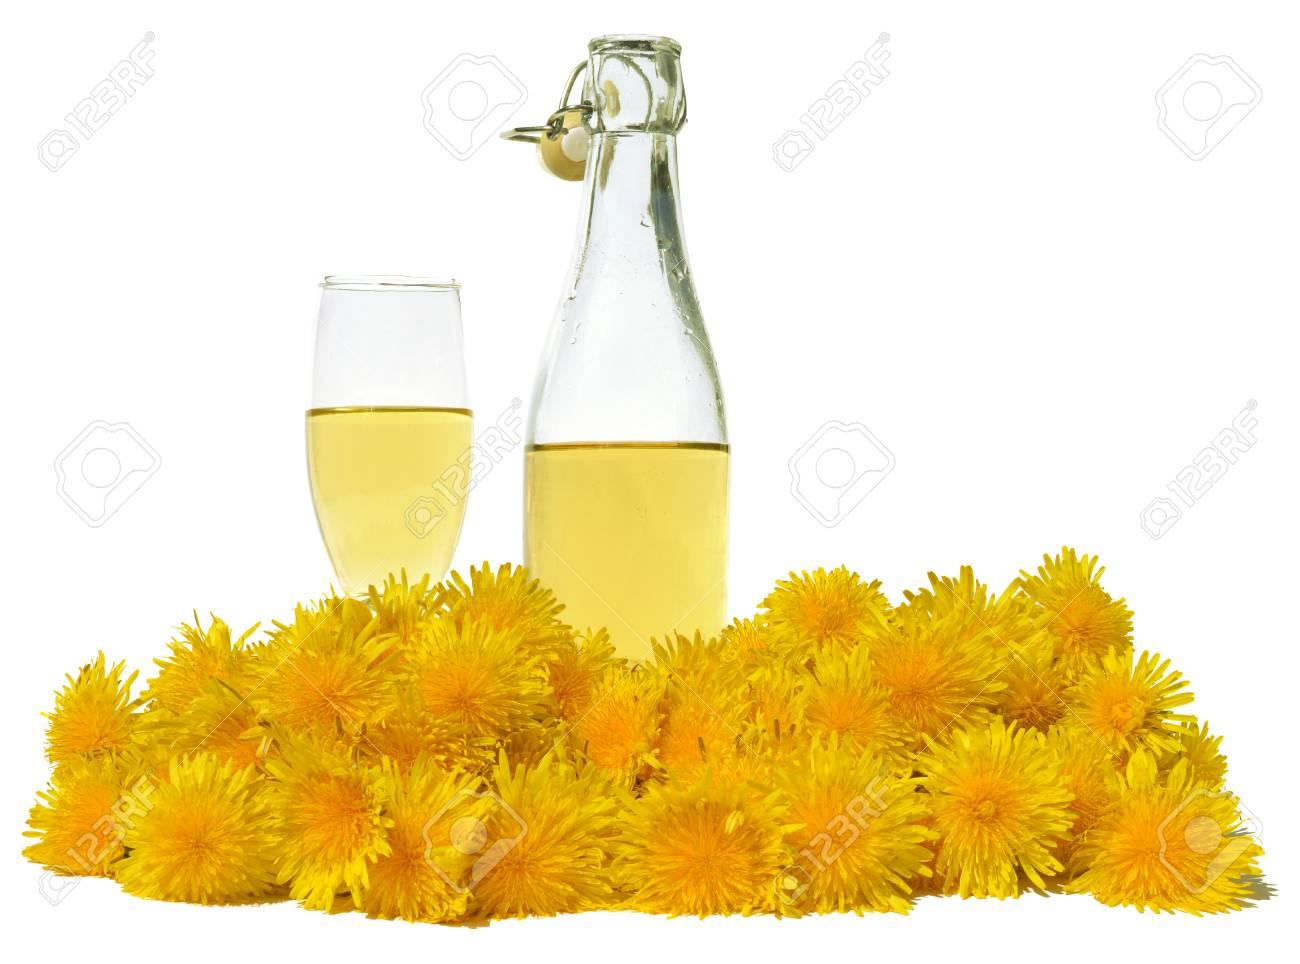 Dandelion Wine in glass and bottle - 39027669